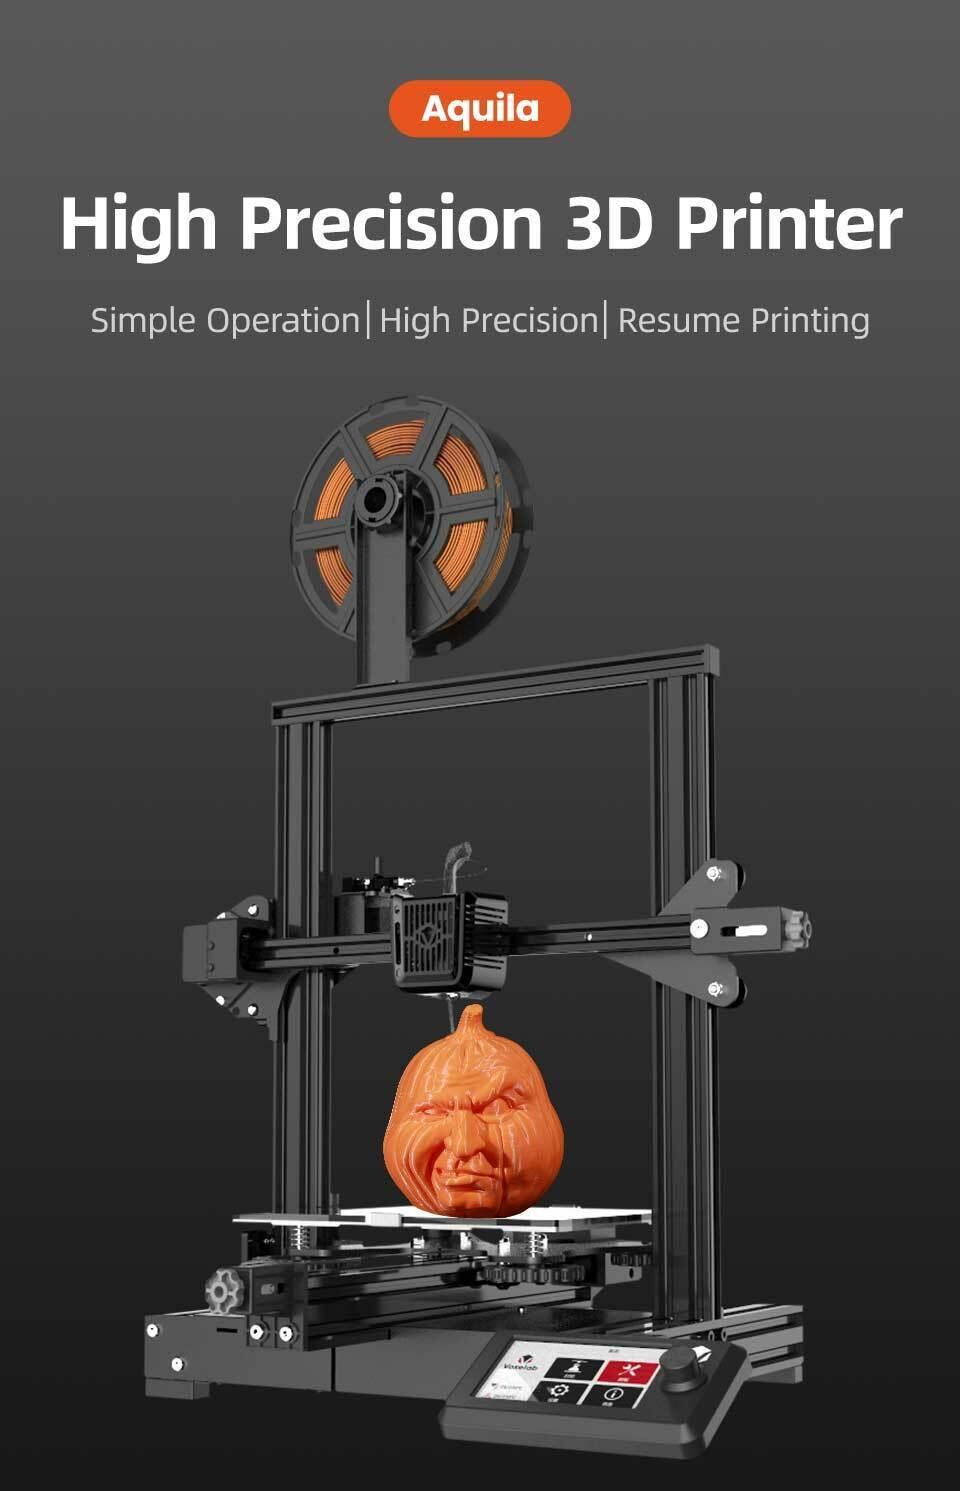 Voxelab Aquila DIY 3D Printer Kit High Precision Part Assembled 220x220x250mm UK